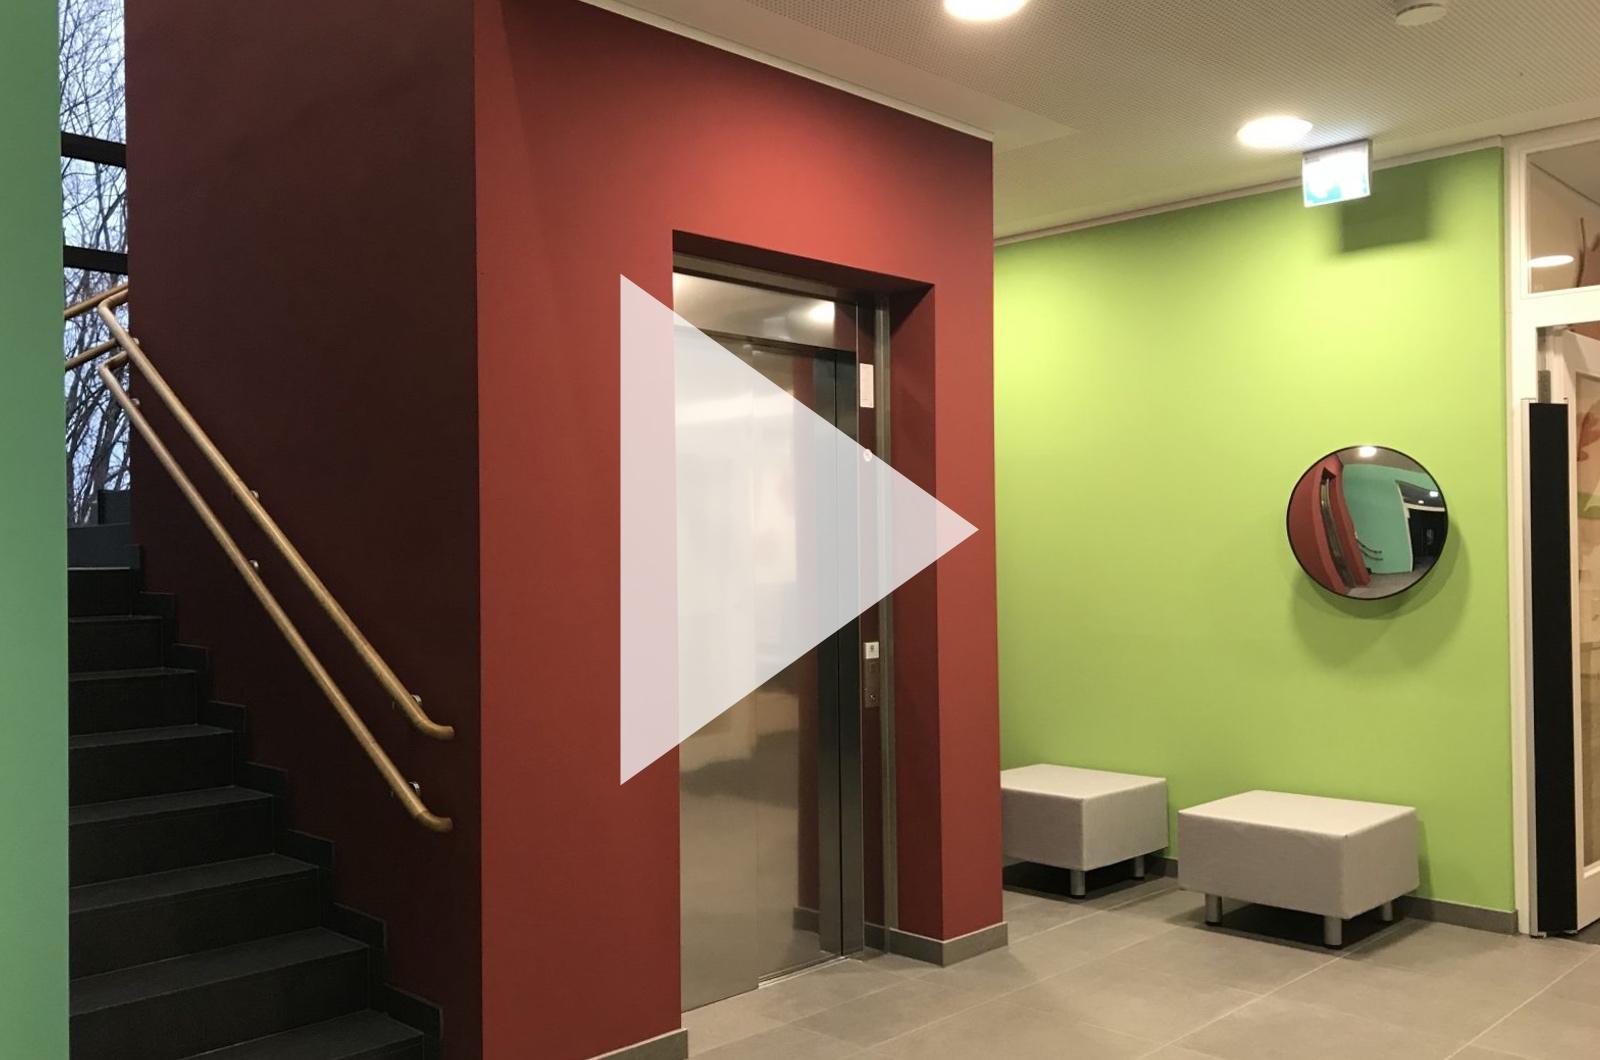 Videos – Hilpert + Kollegen Architekten BDA